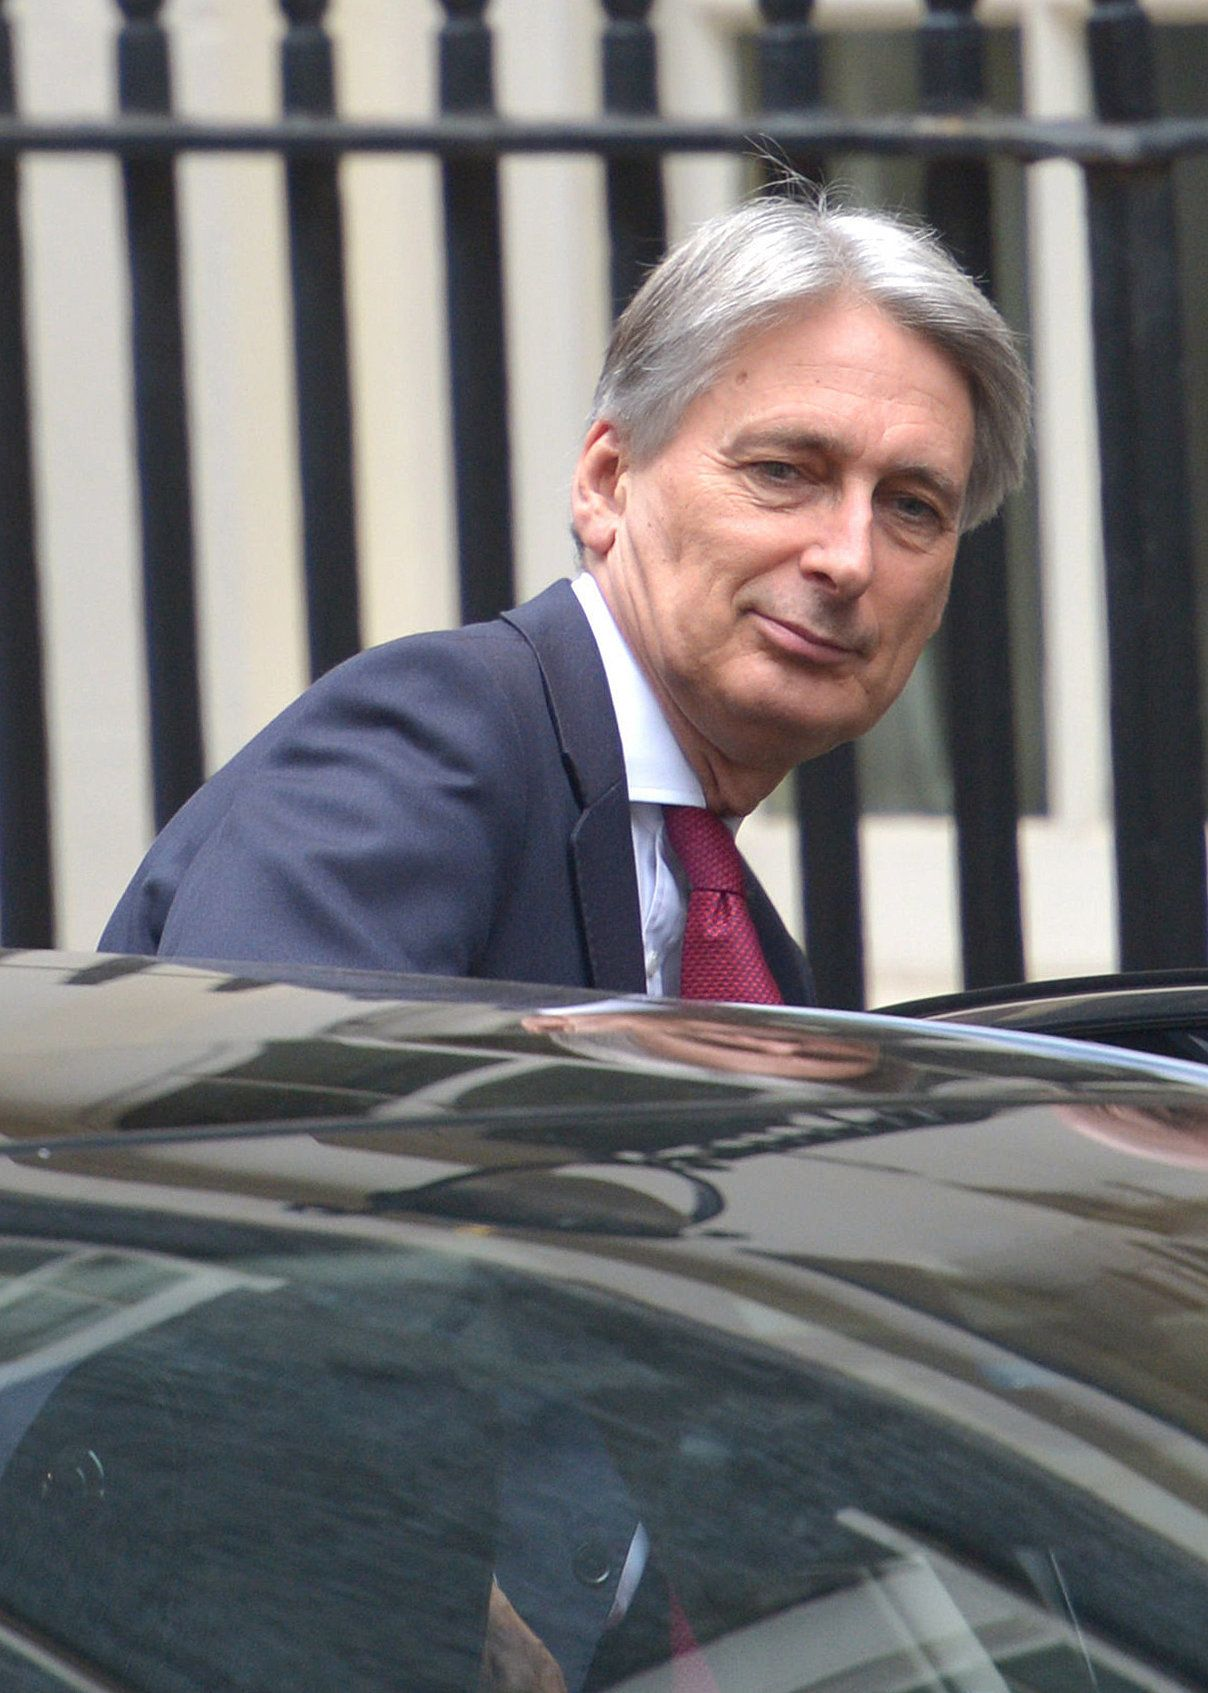 Chancellor Philip Hammond Admits Brexit Will Make UK